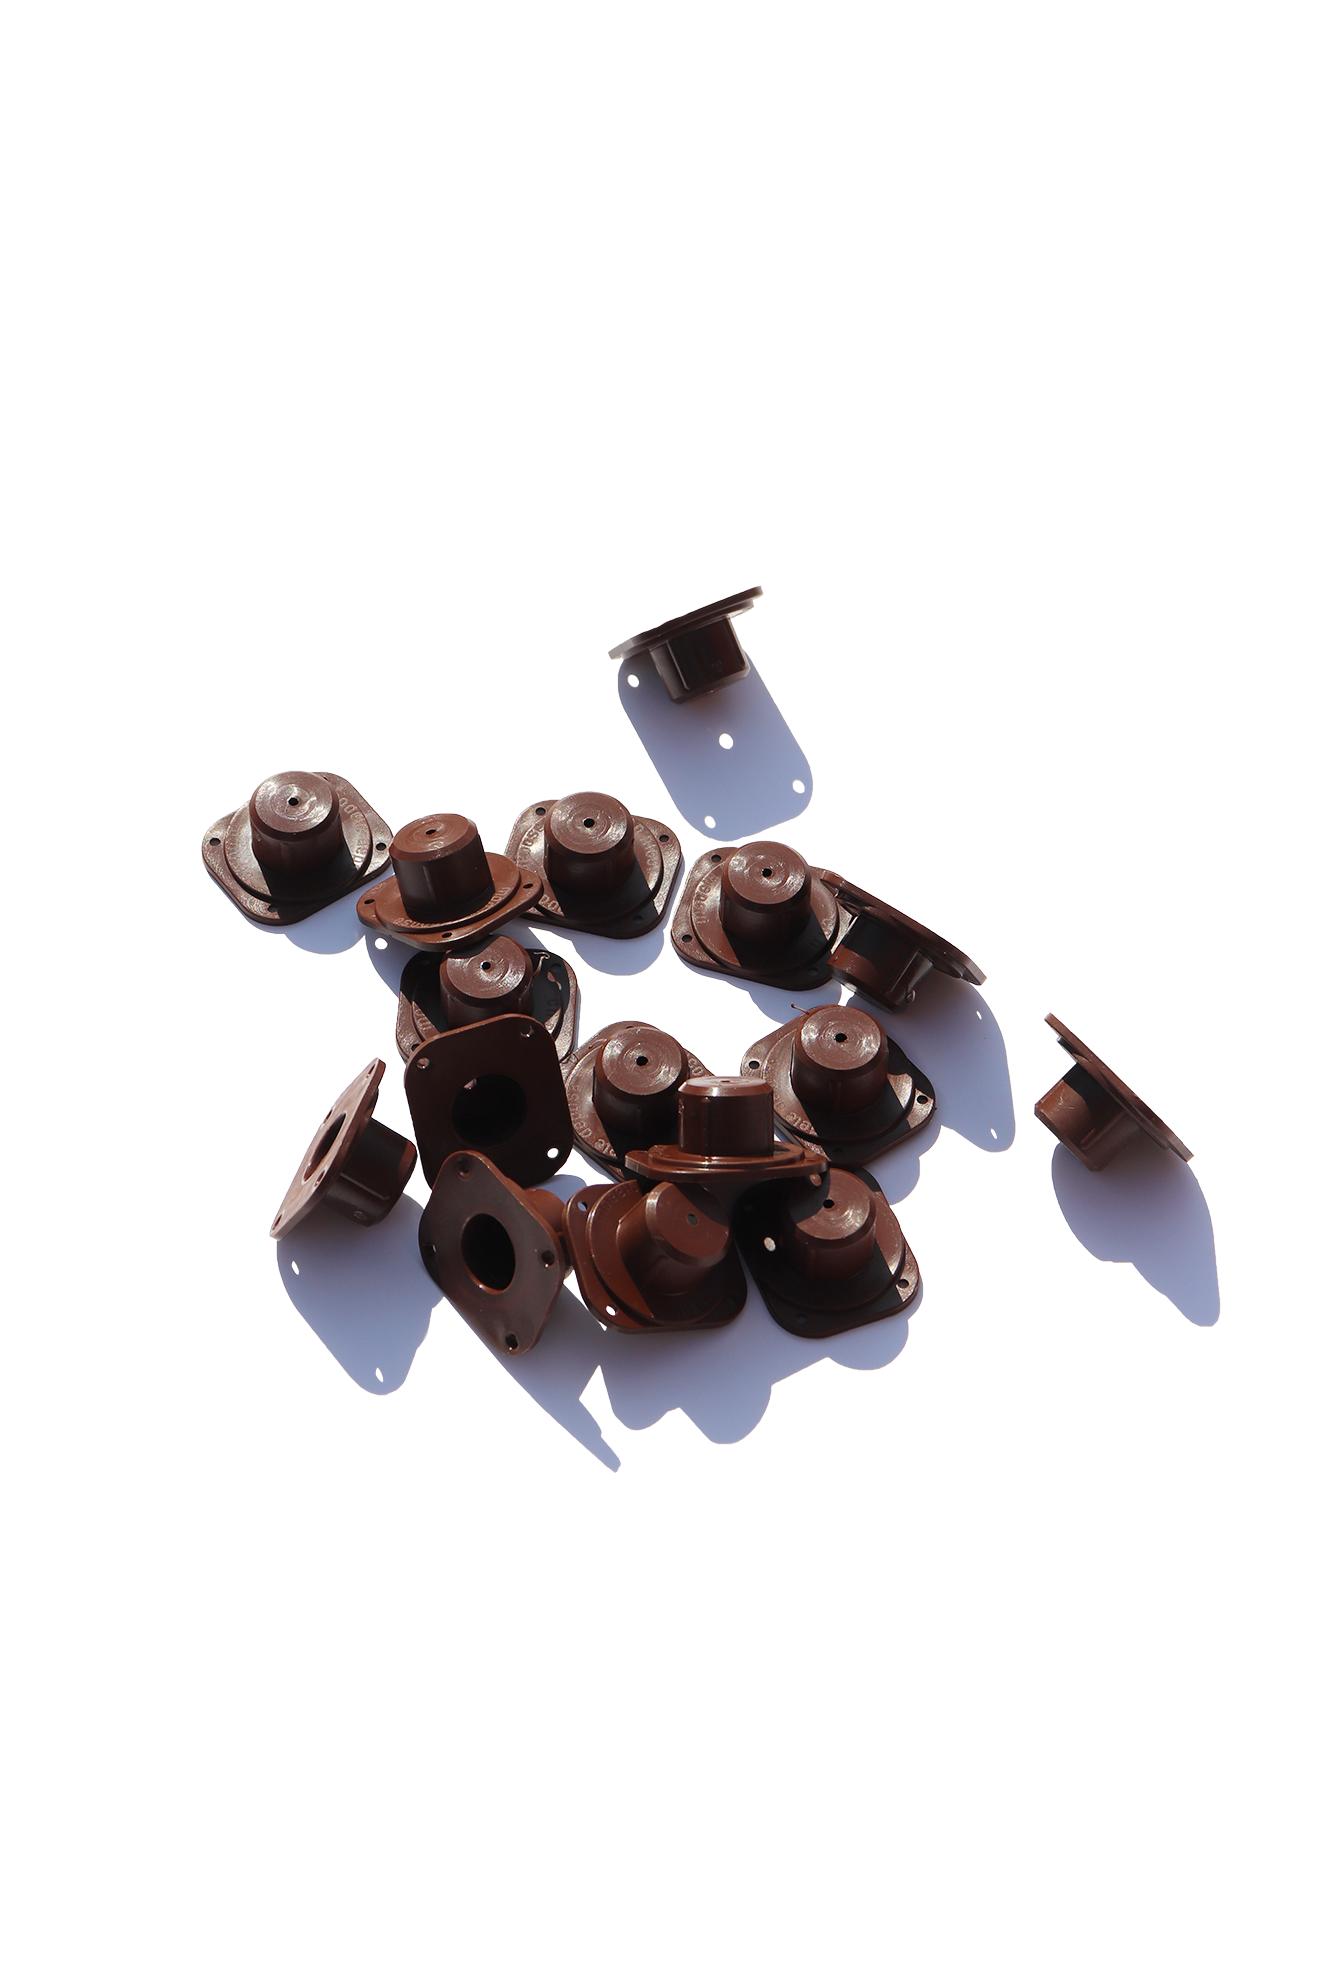 Bruine nicot bevestiger (10 stuks)-1